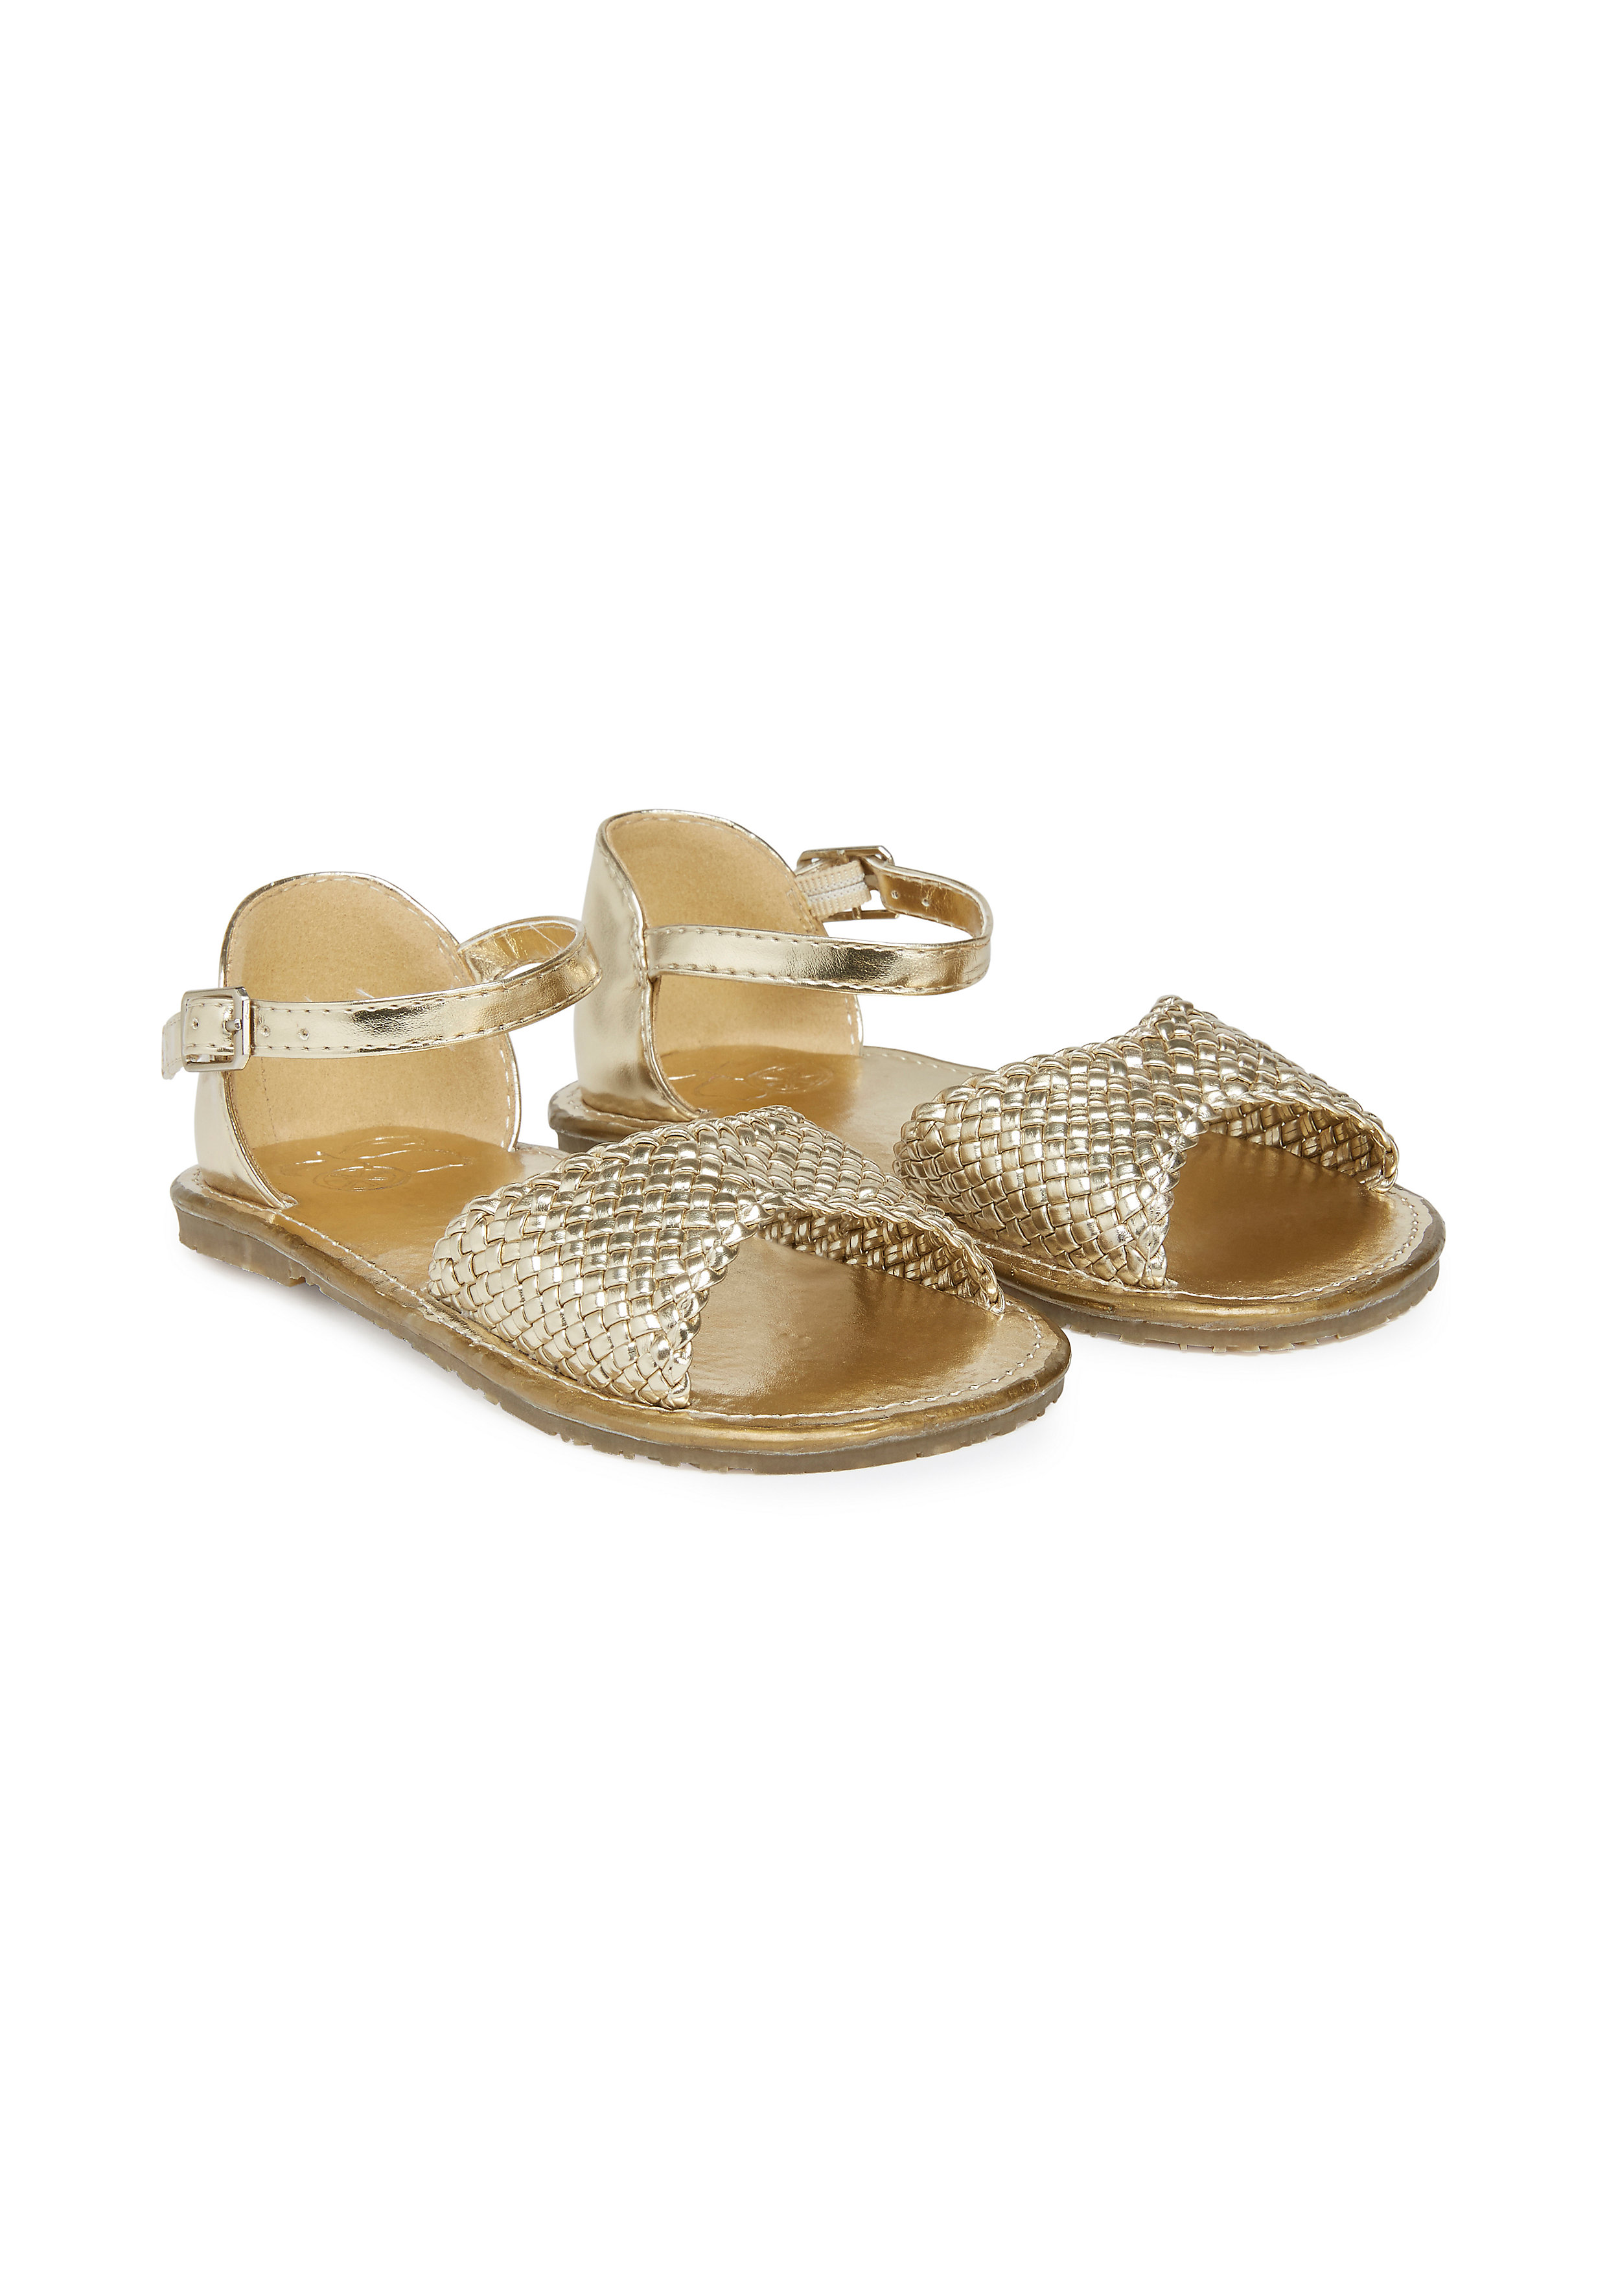 Mothercare | Girls Metallic Woven Sandals - Gold